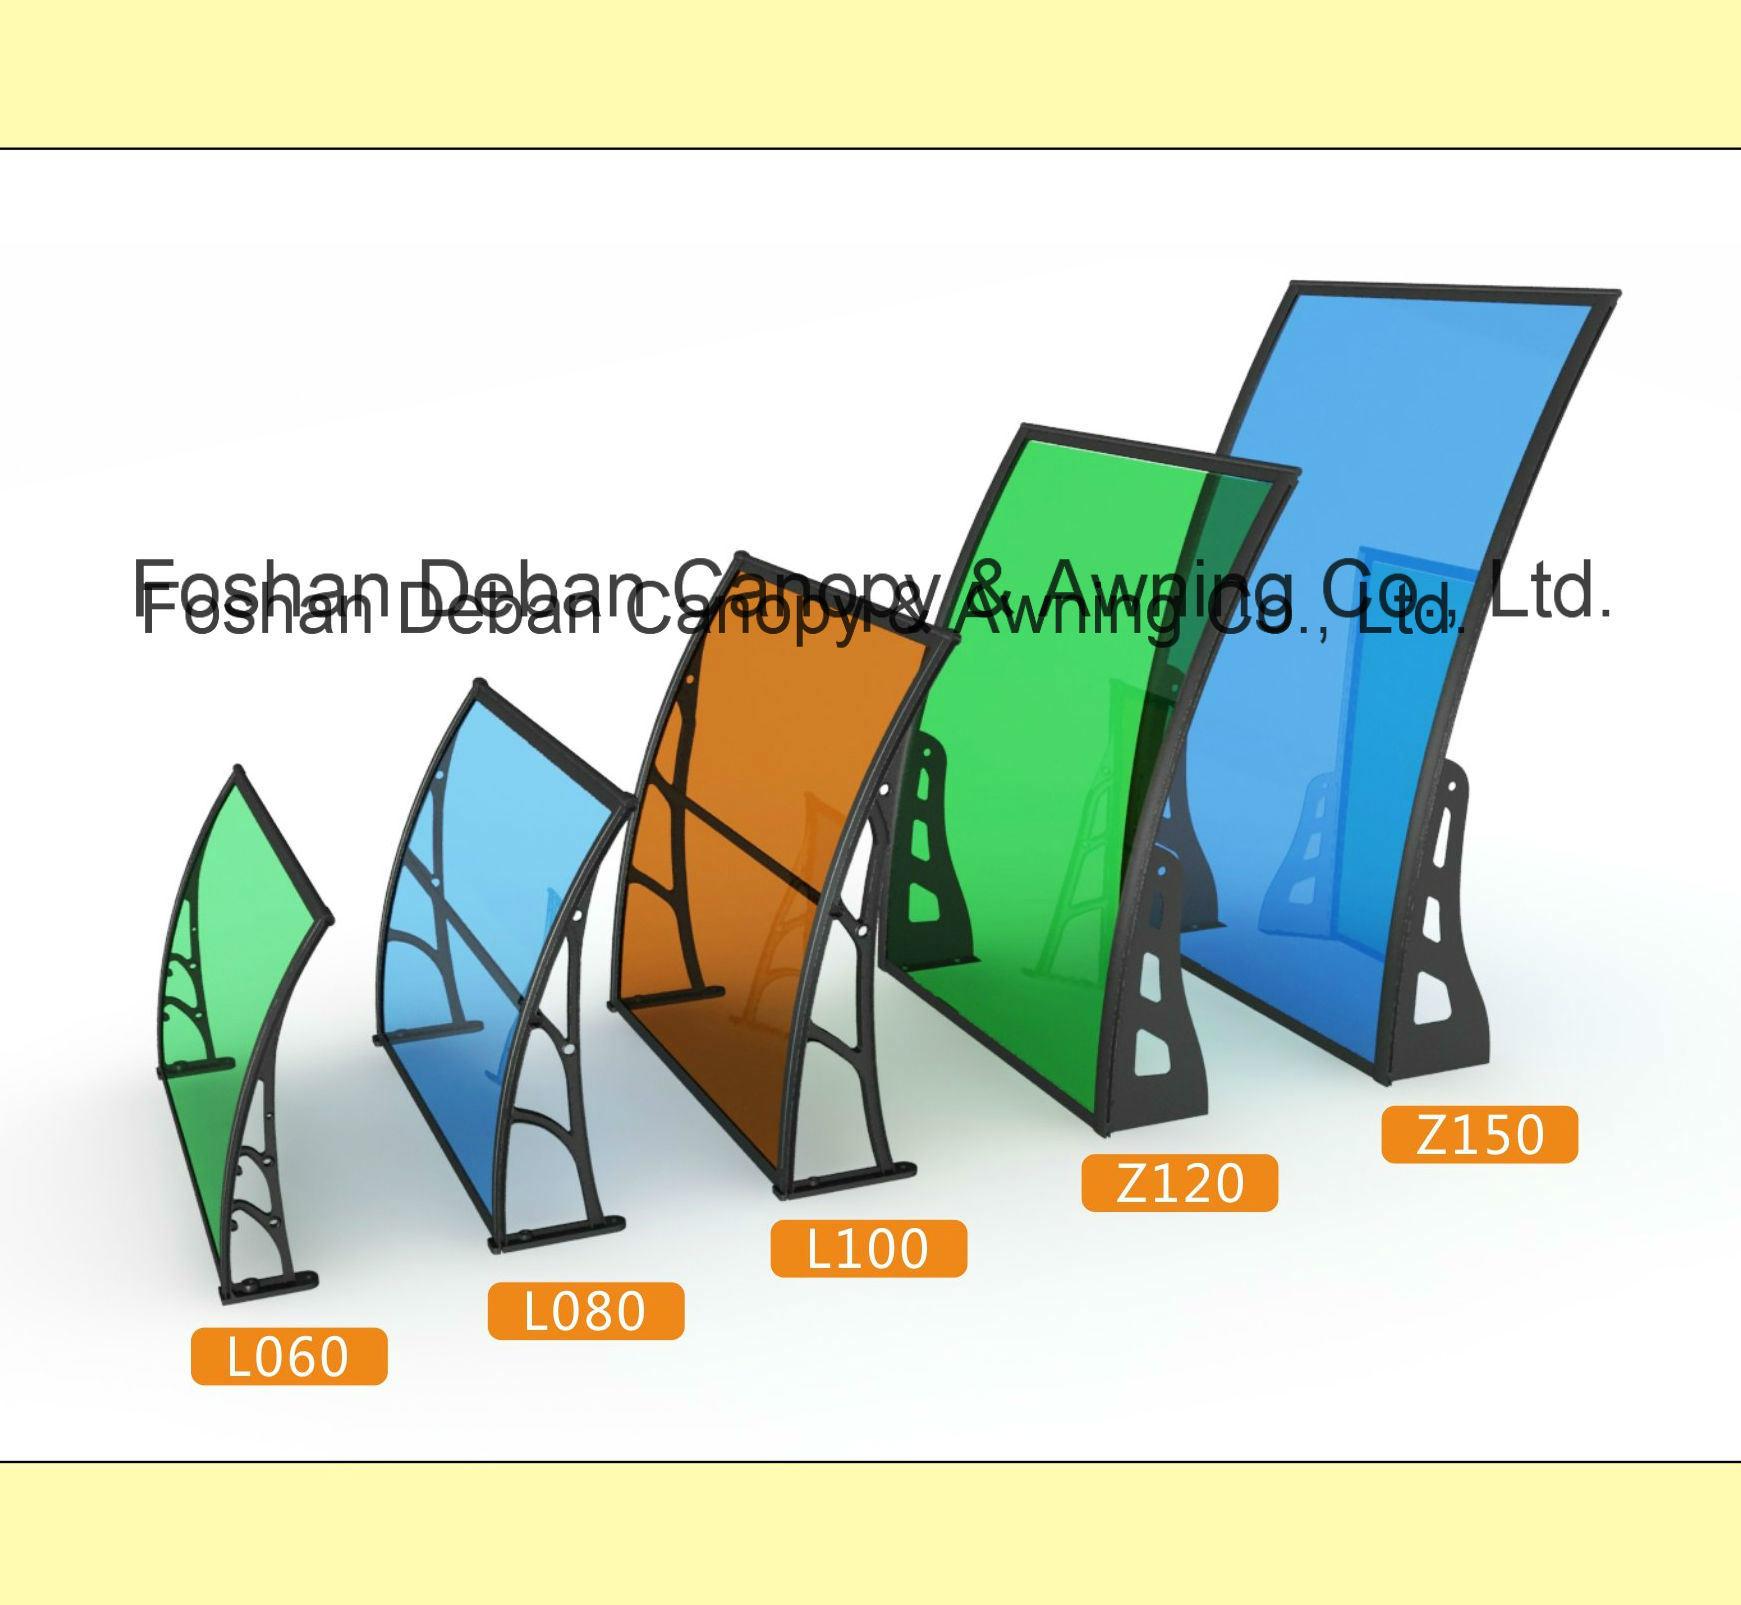 Aluminum /Polycarbonate Awning for Doors and Windows /Sunshade